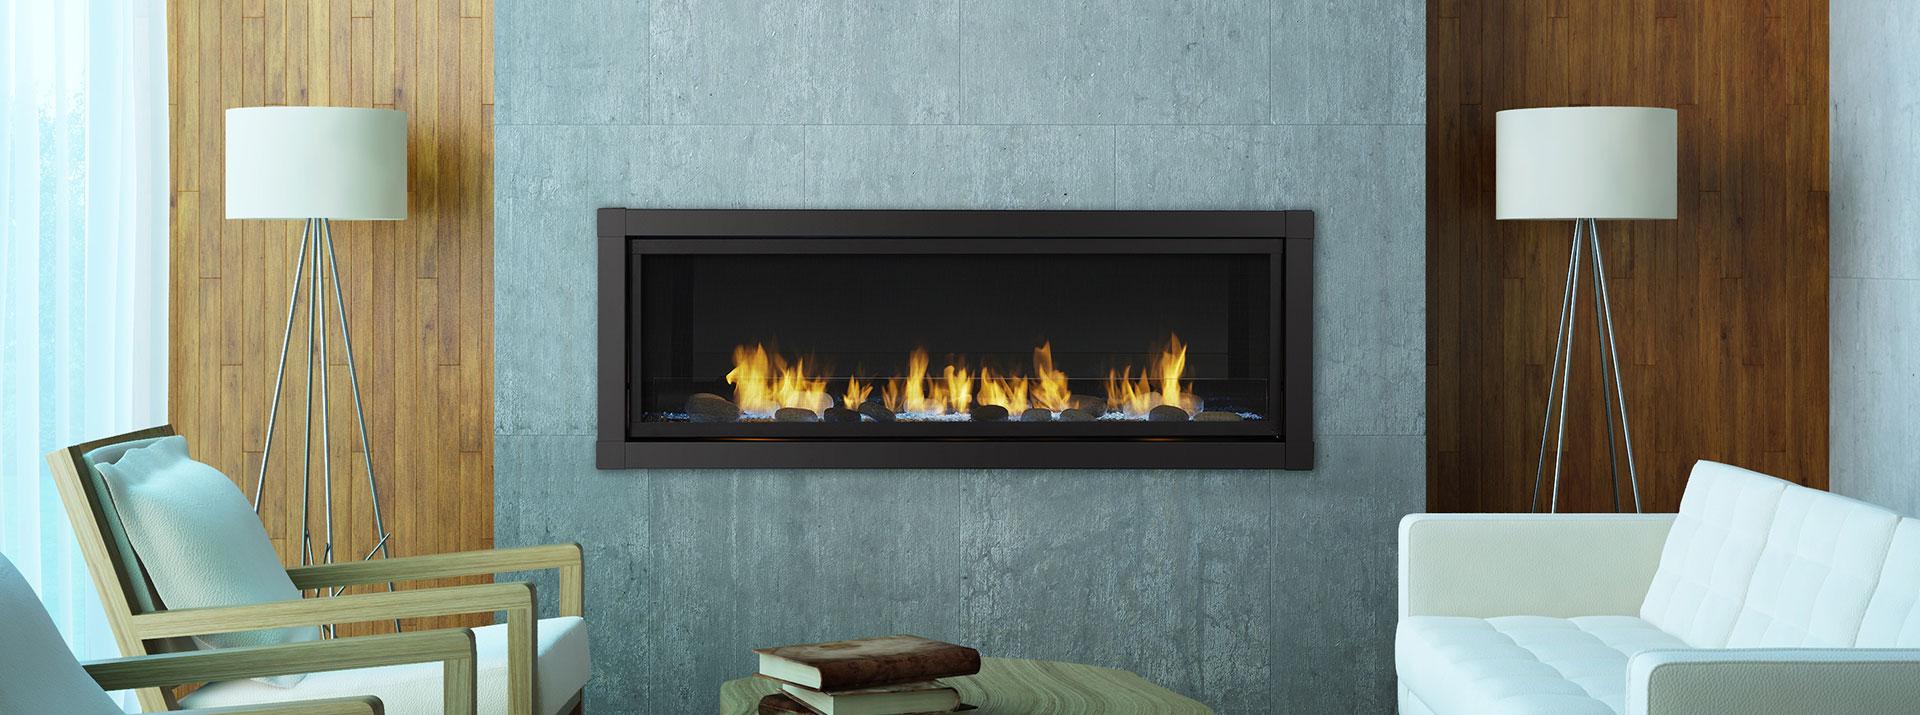 Artisan Vent Free Gas Fireplaces  Monessen Hearth